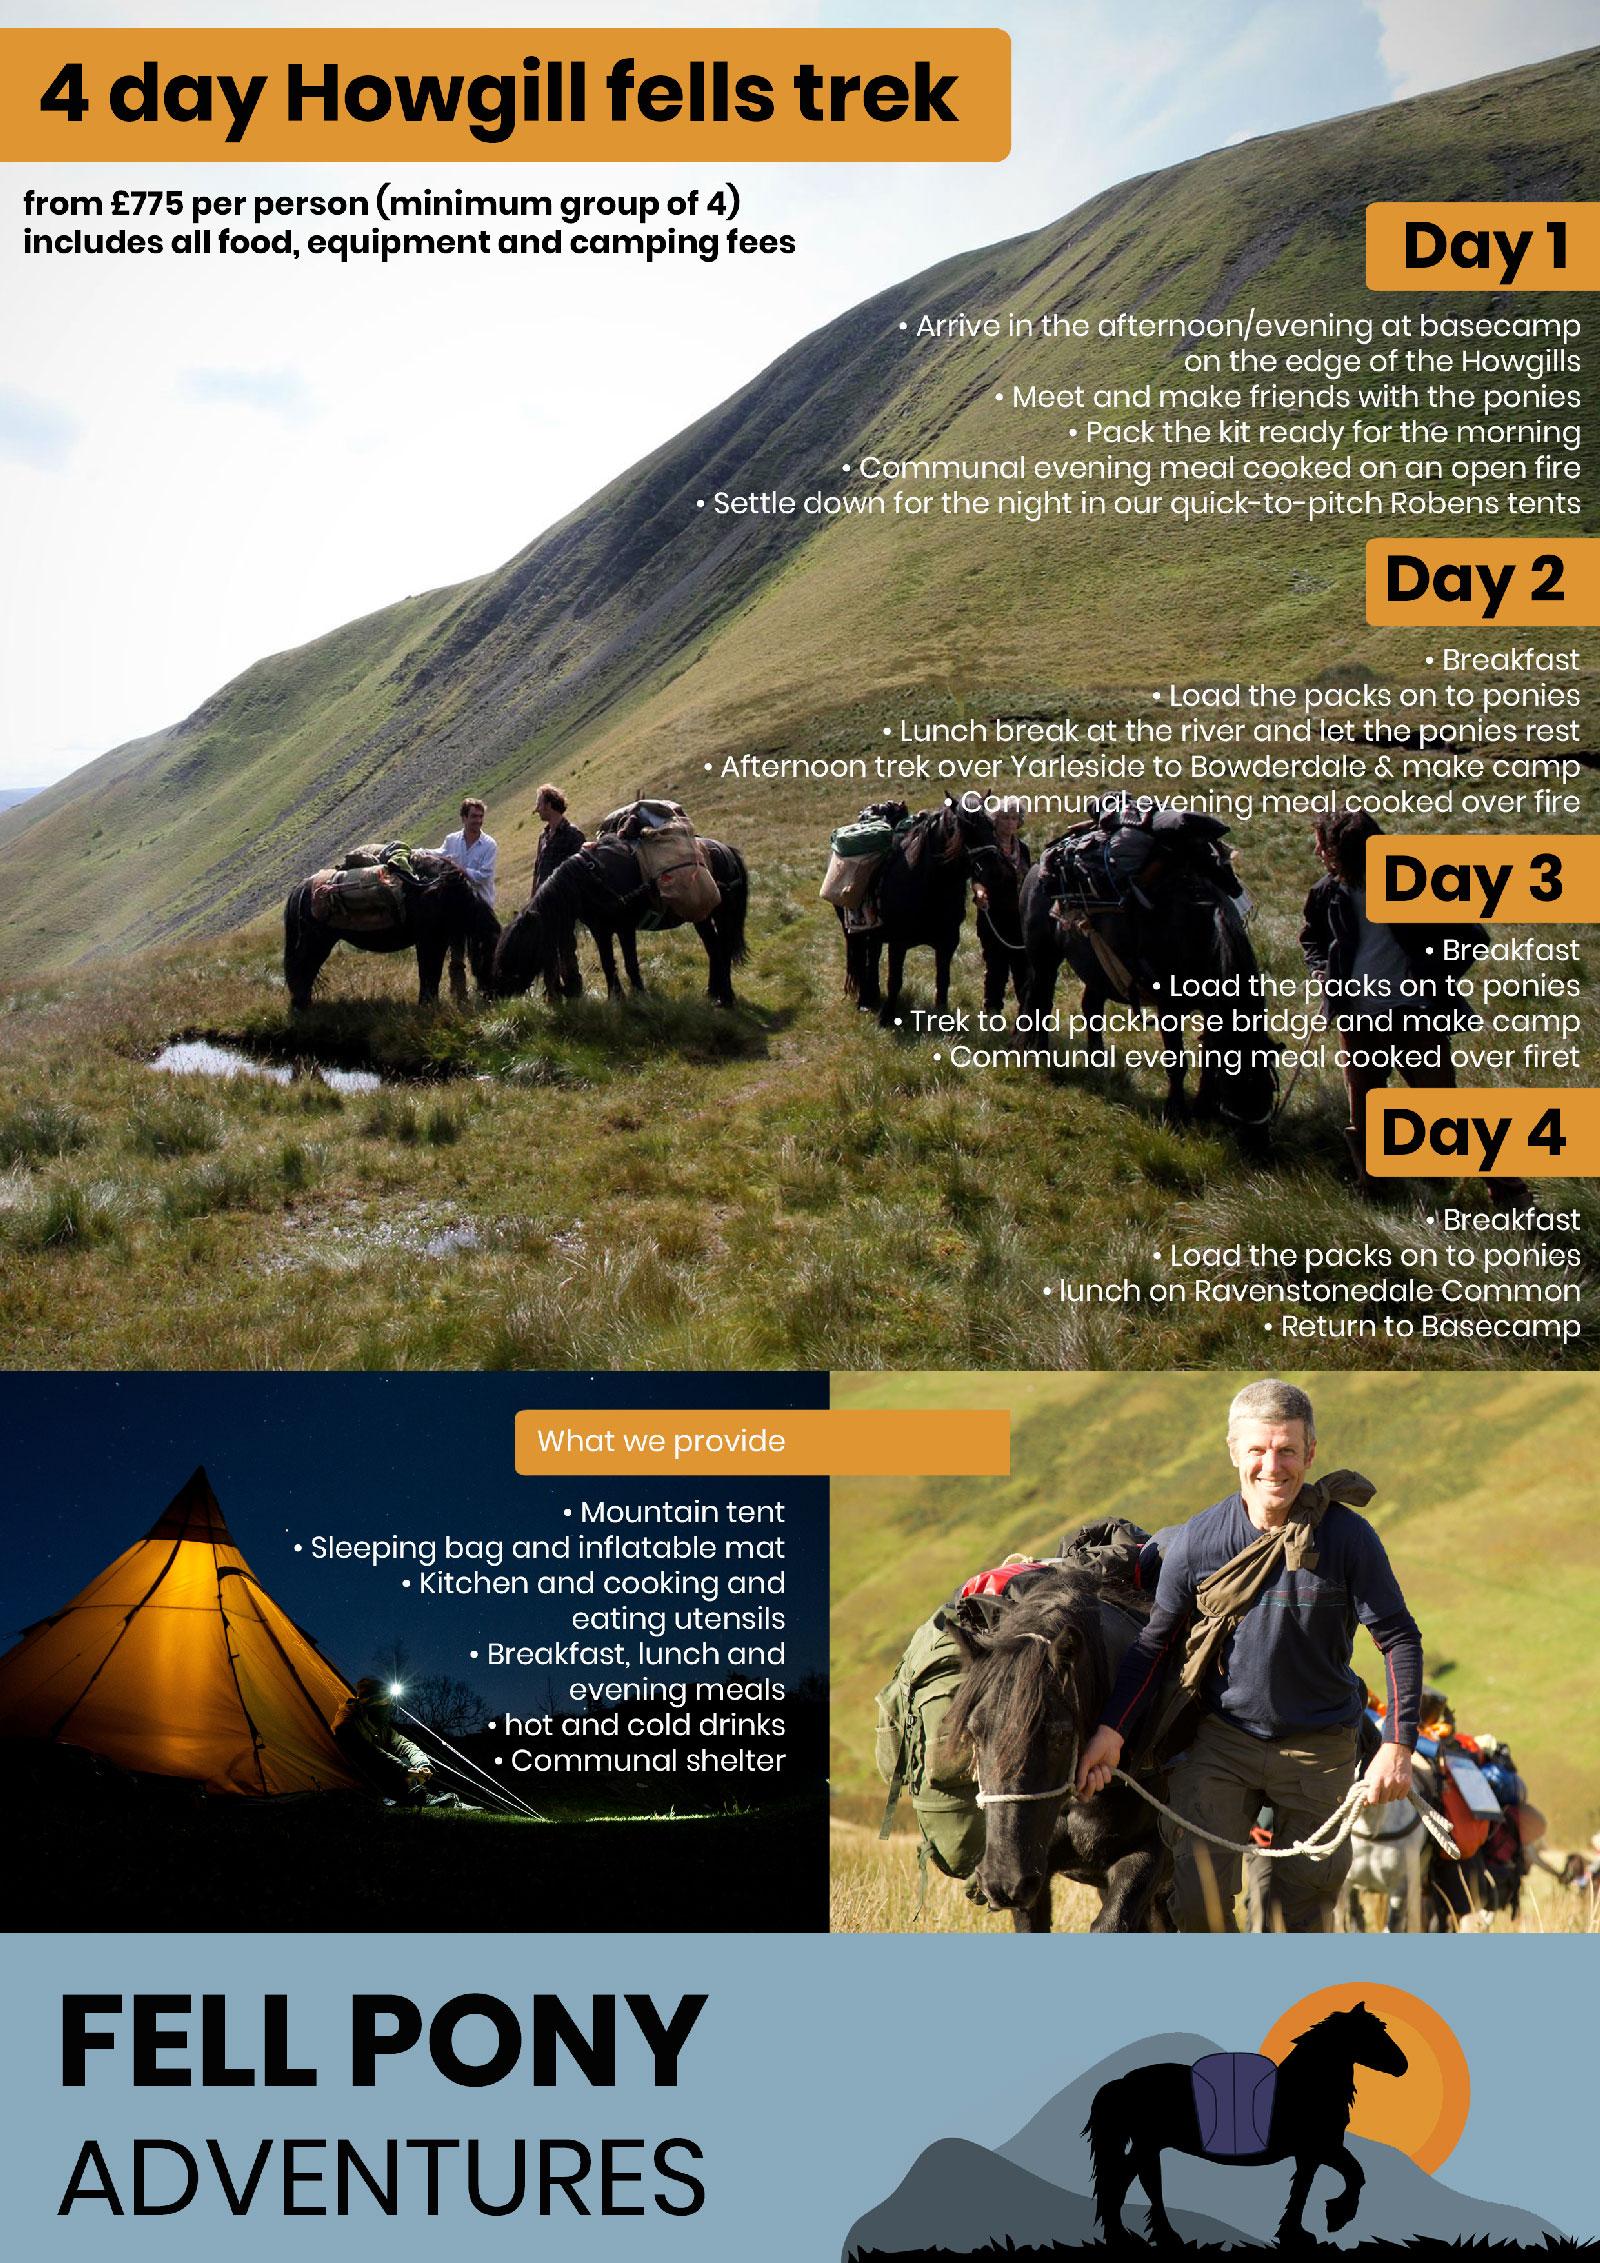 Howgill fells 4 day trek itinerary